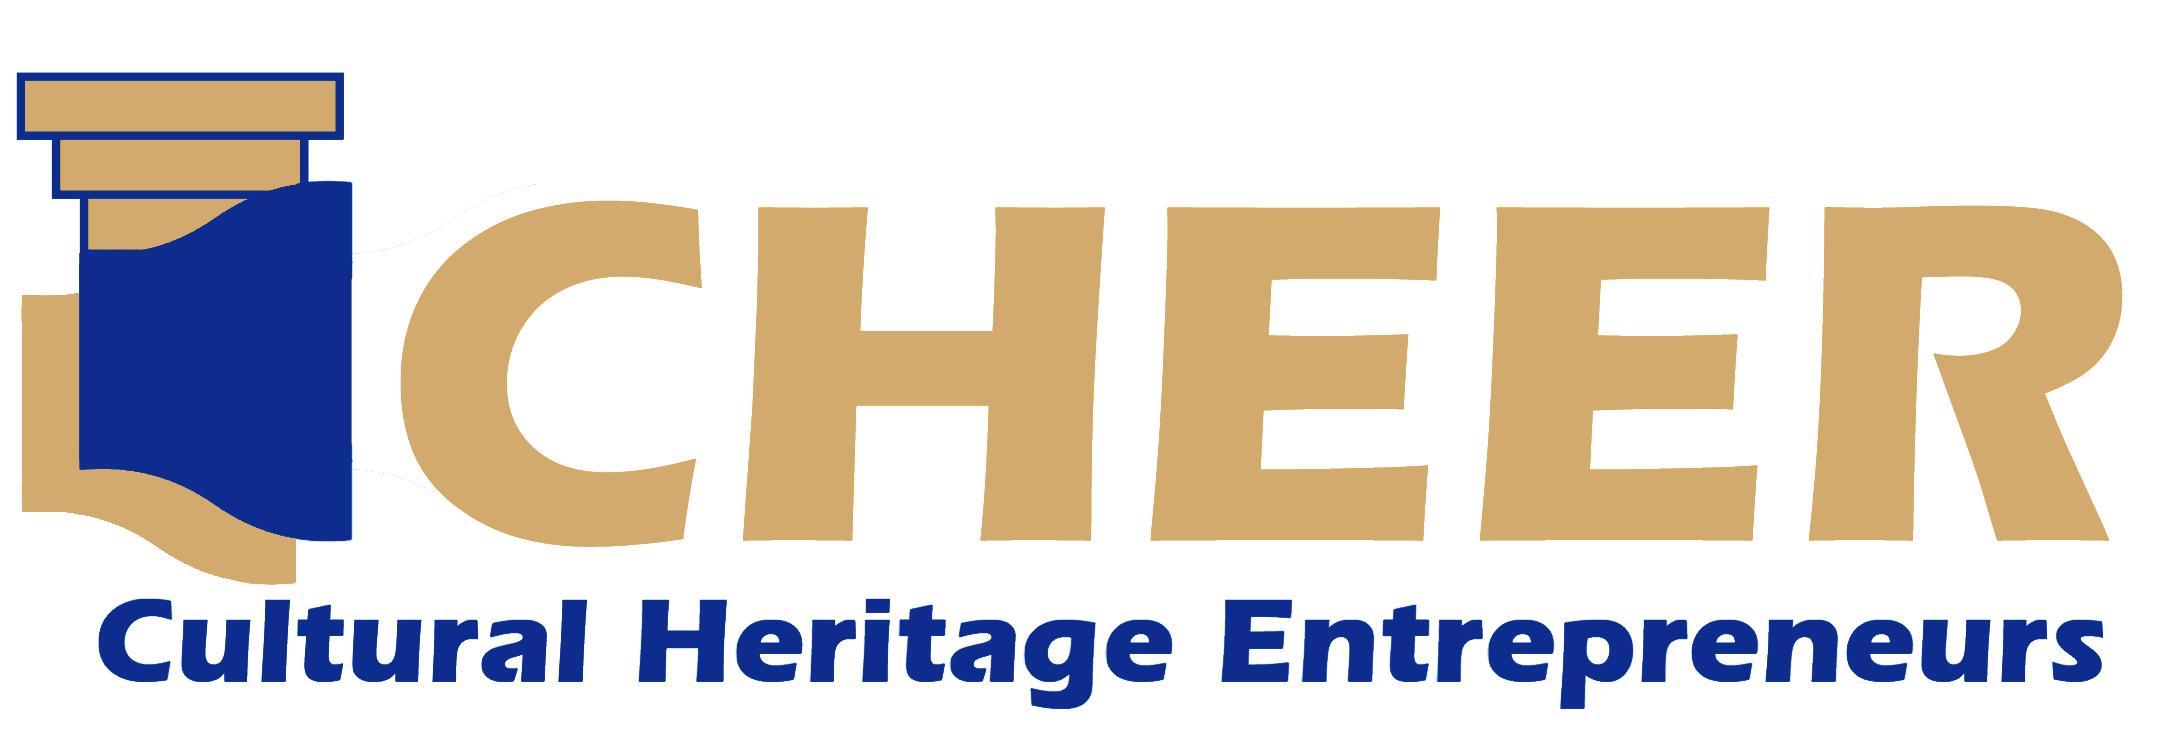 CHEER logo